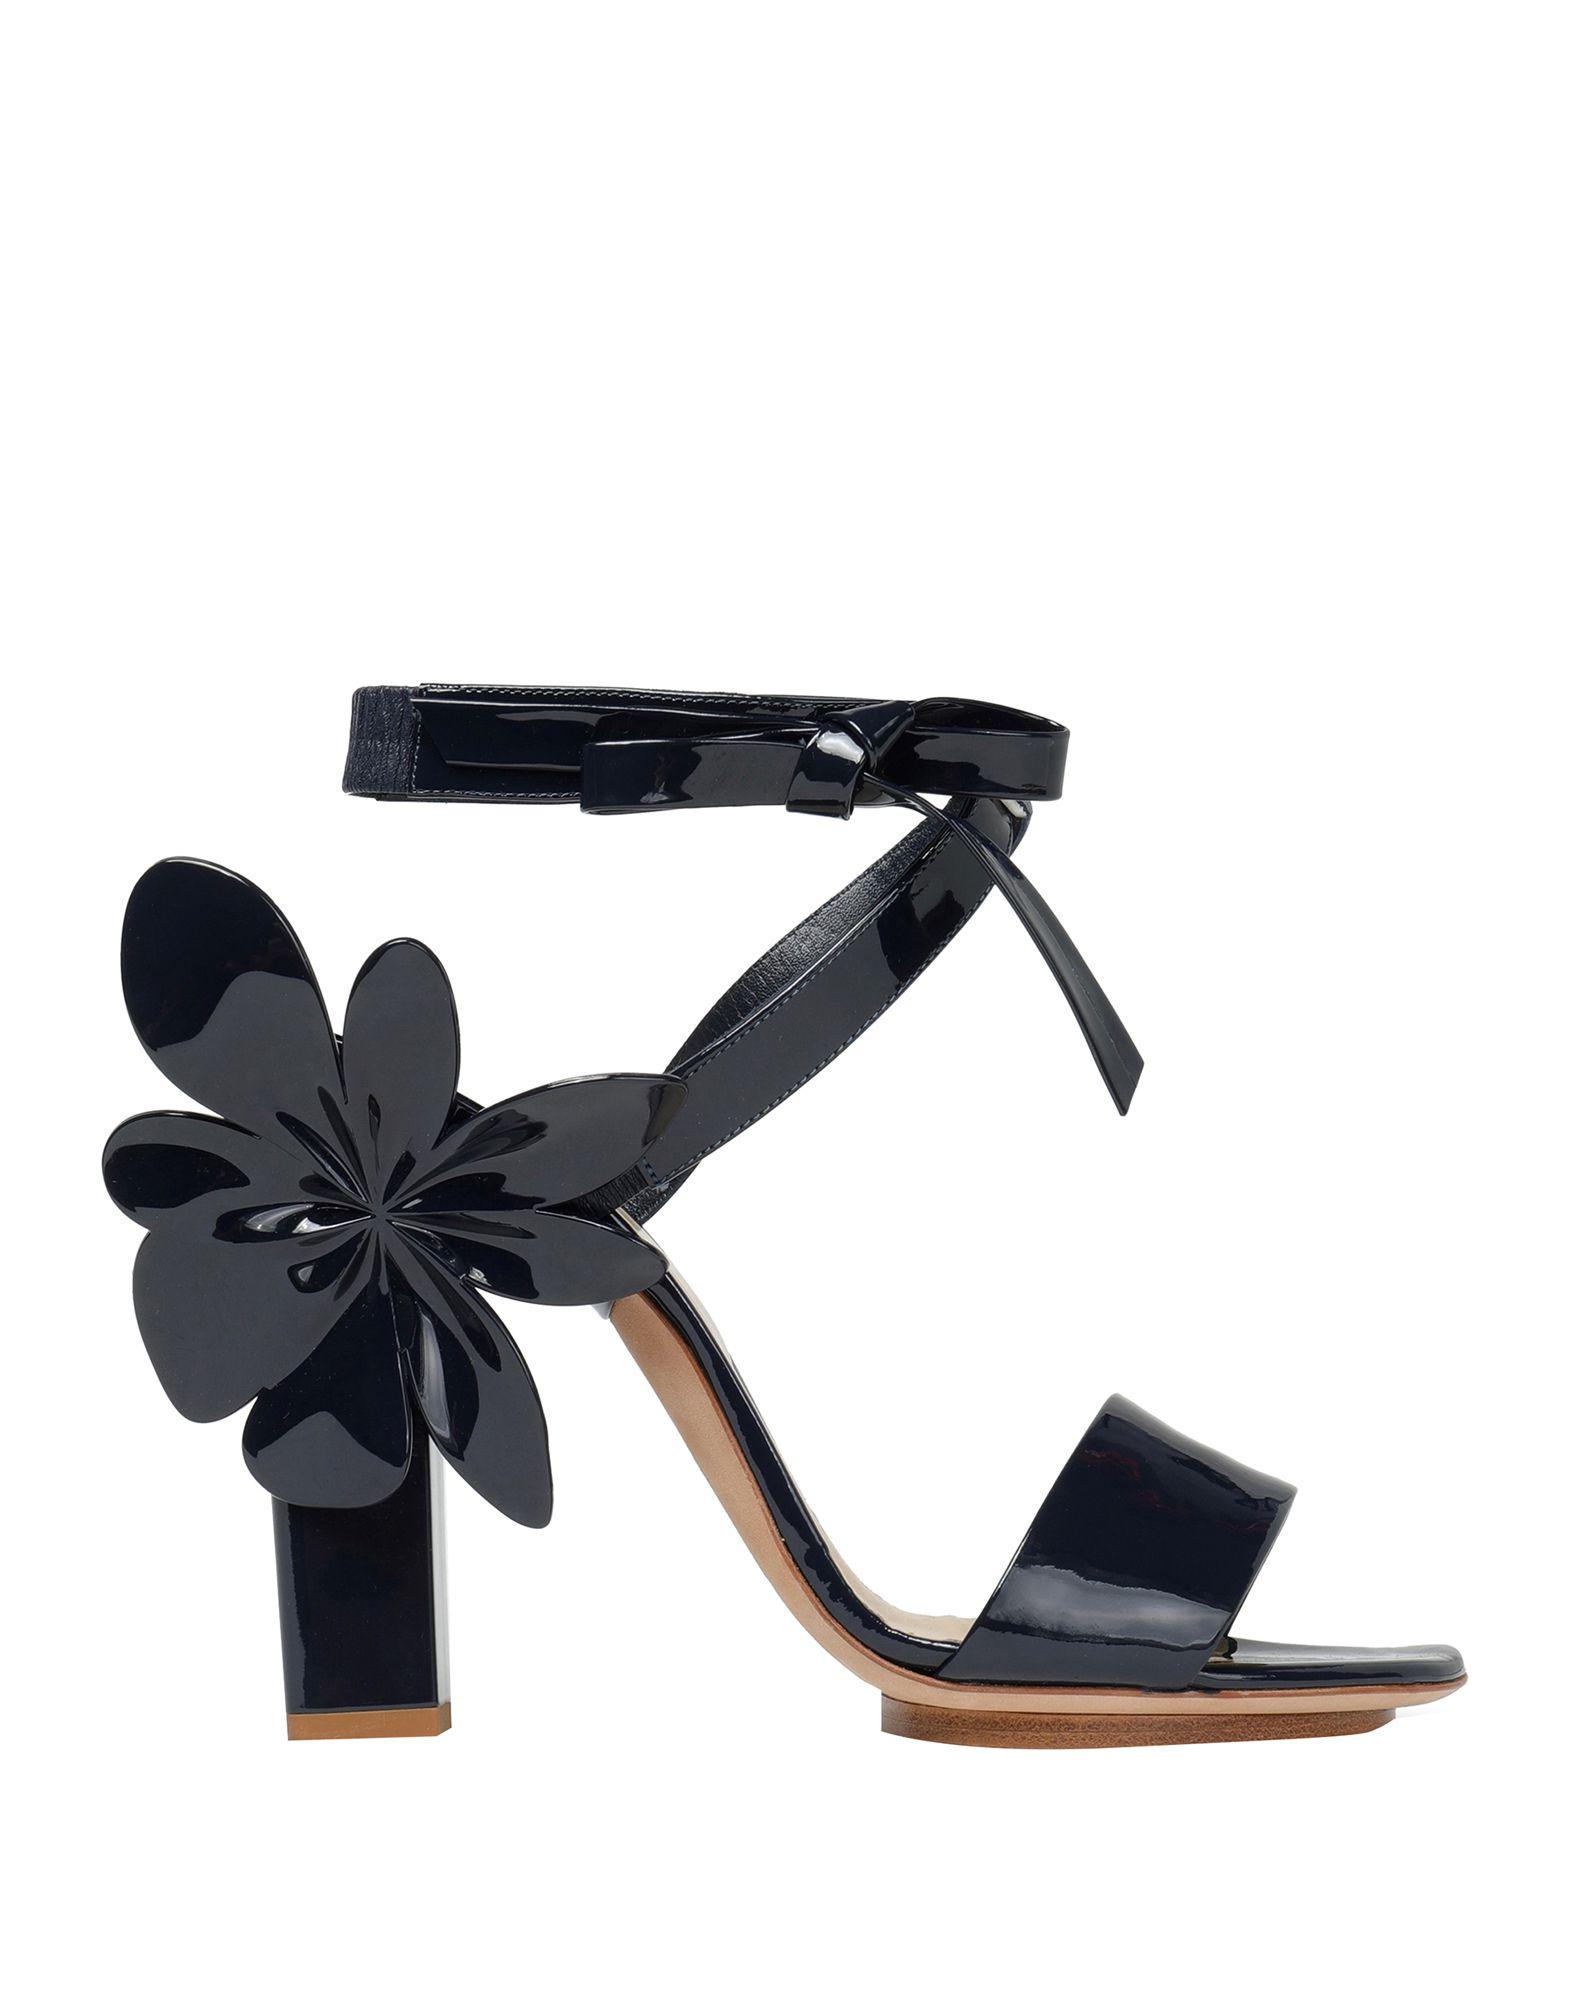 DELPOZO | DELPOZO Sandals 11697564 | Goxip